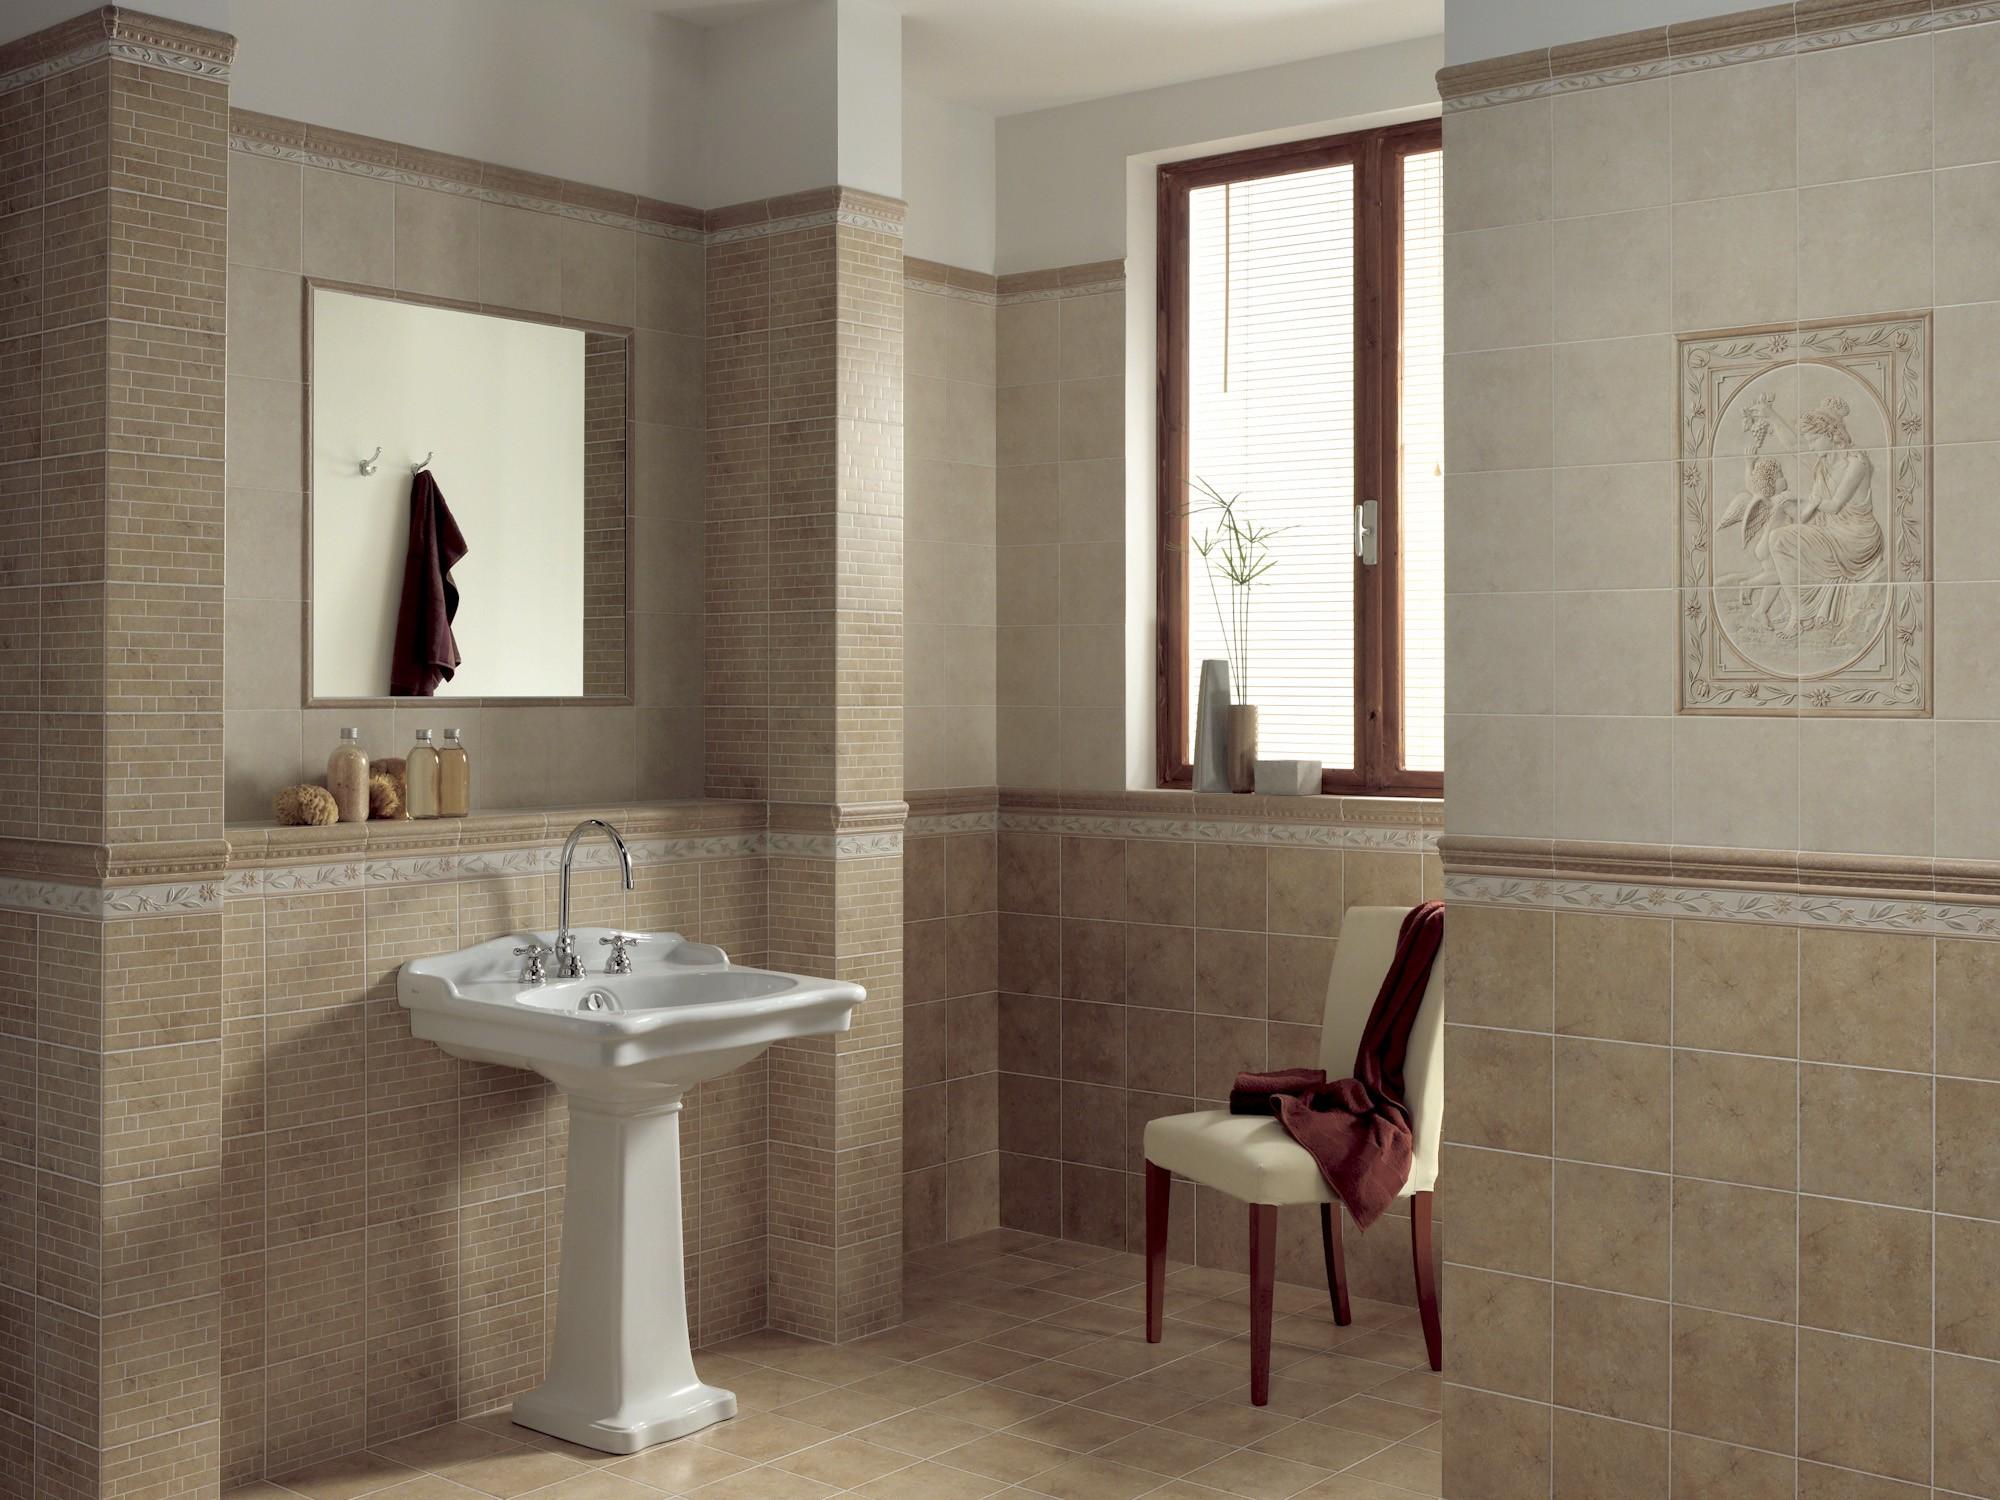 Beige bagno 458 54 la nuova ceramica - Sanitari bagno beige ...